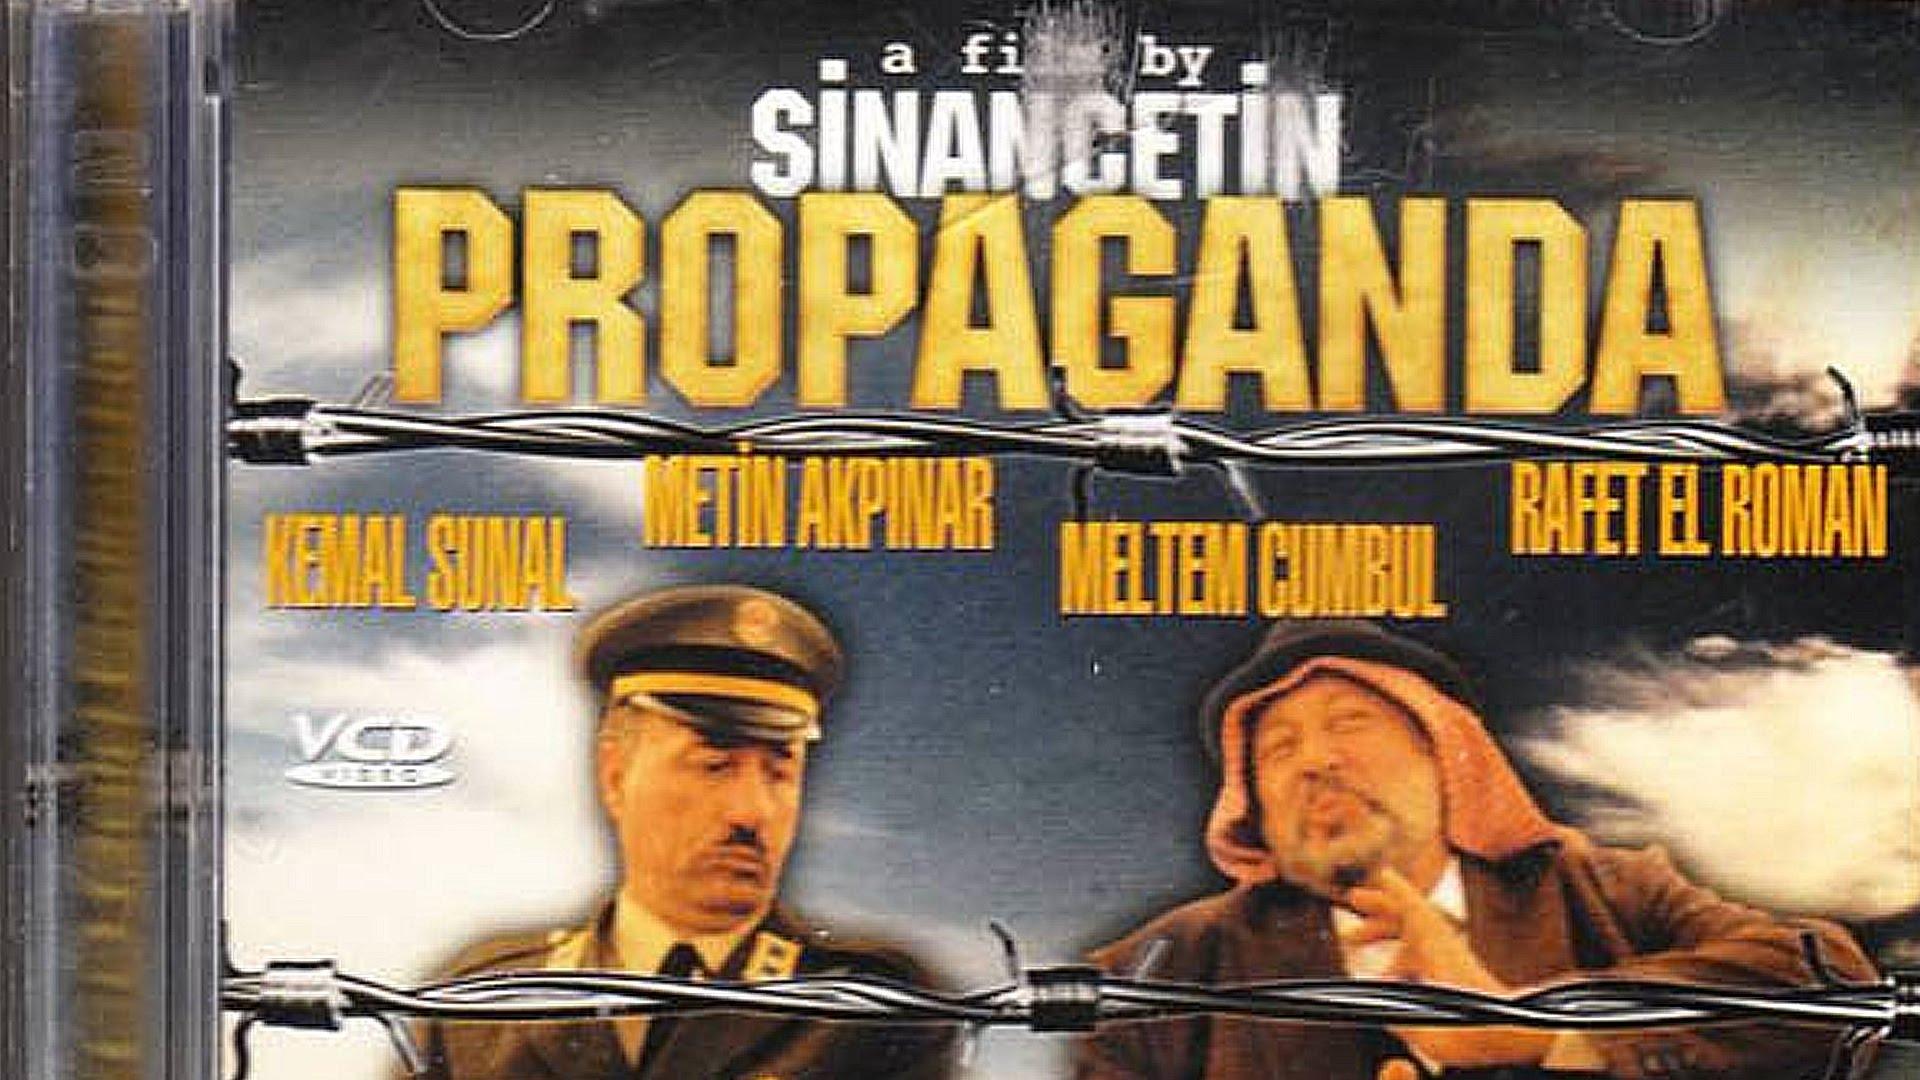 video : Propaganda